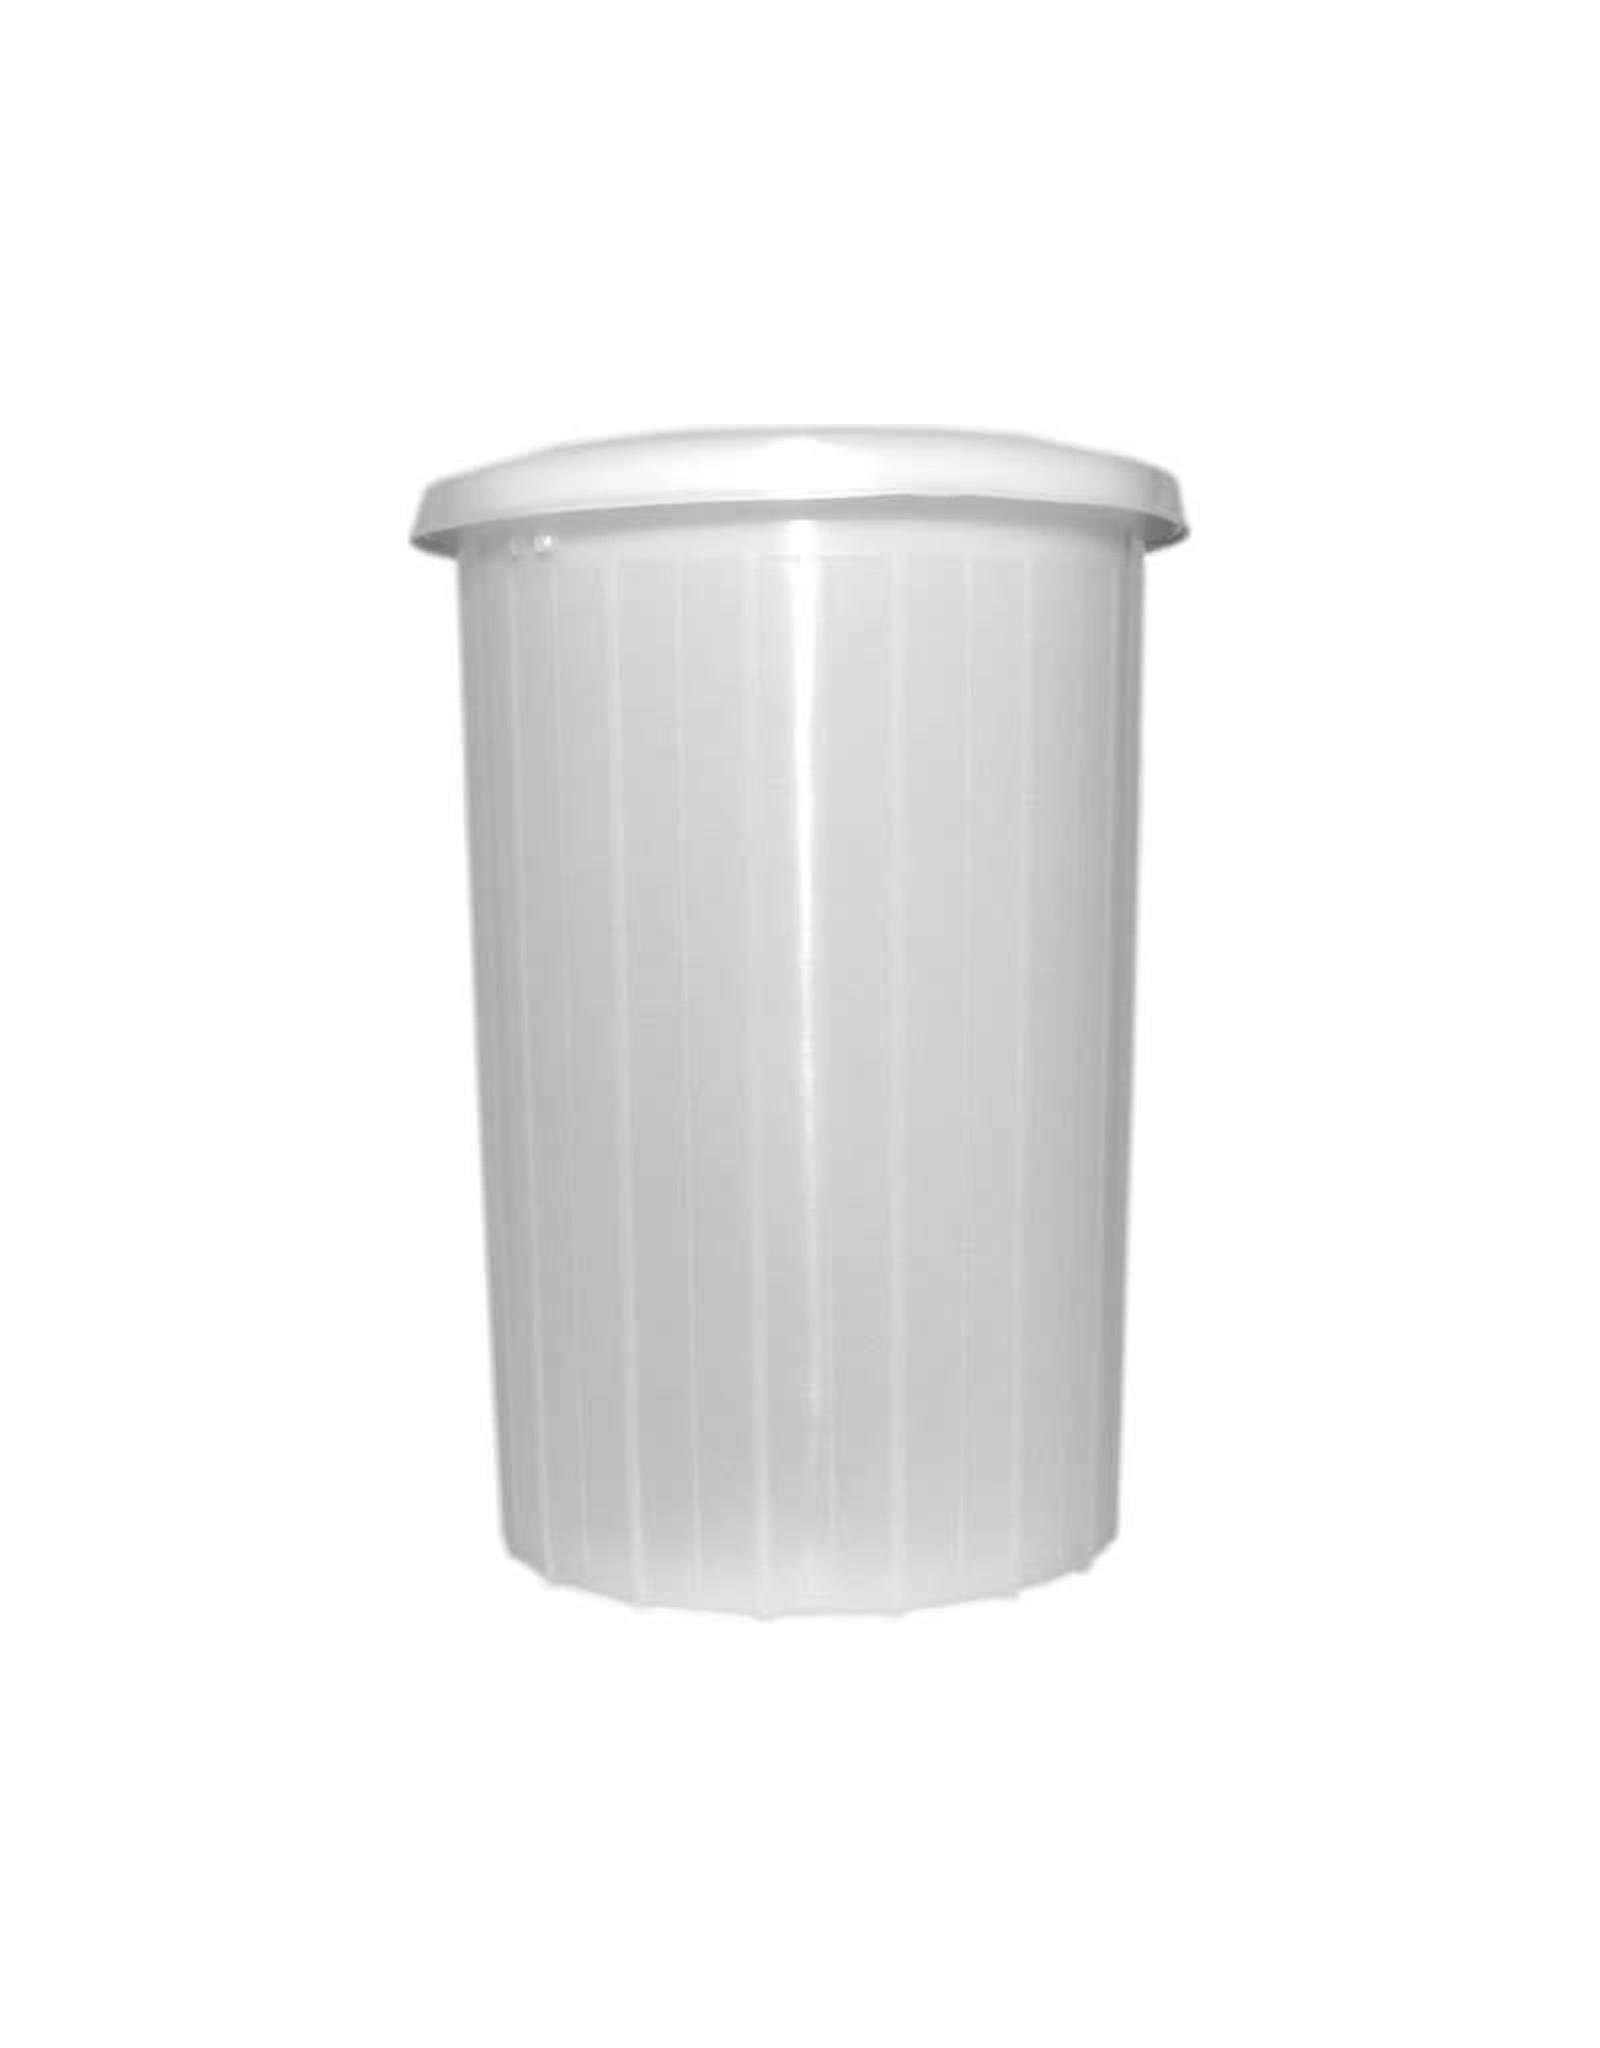 10 GALLON PLASTIC FERMENTER WITH LID